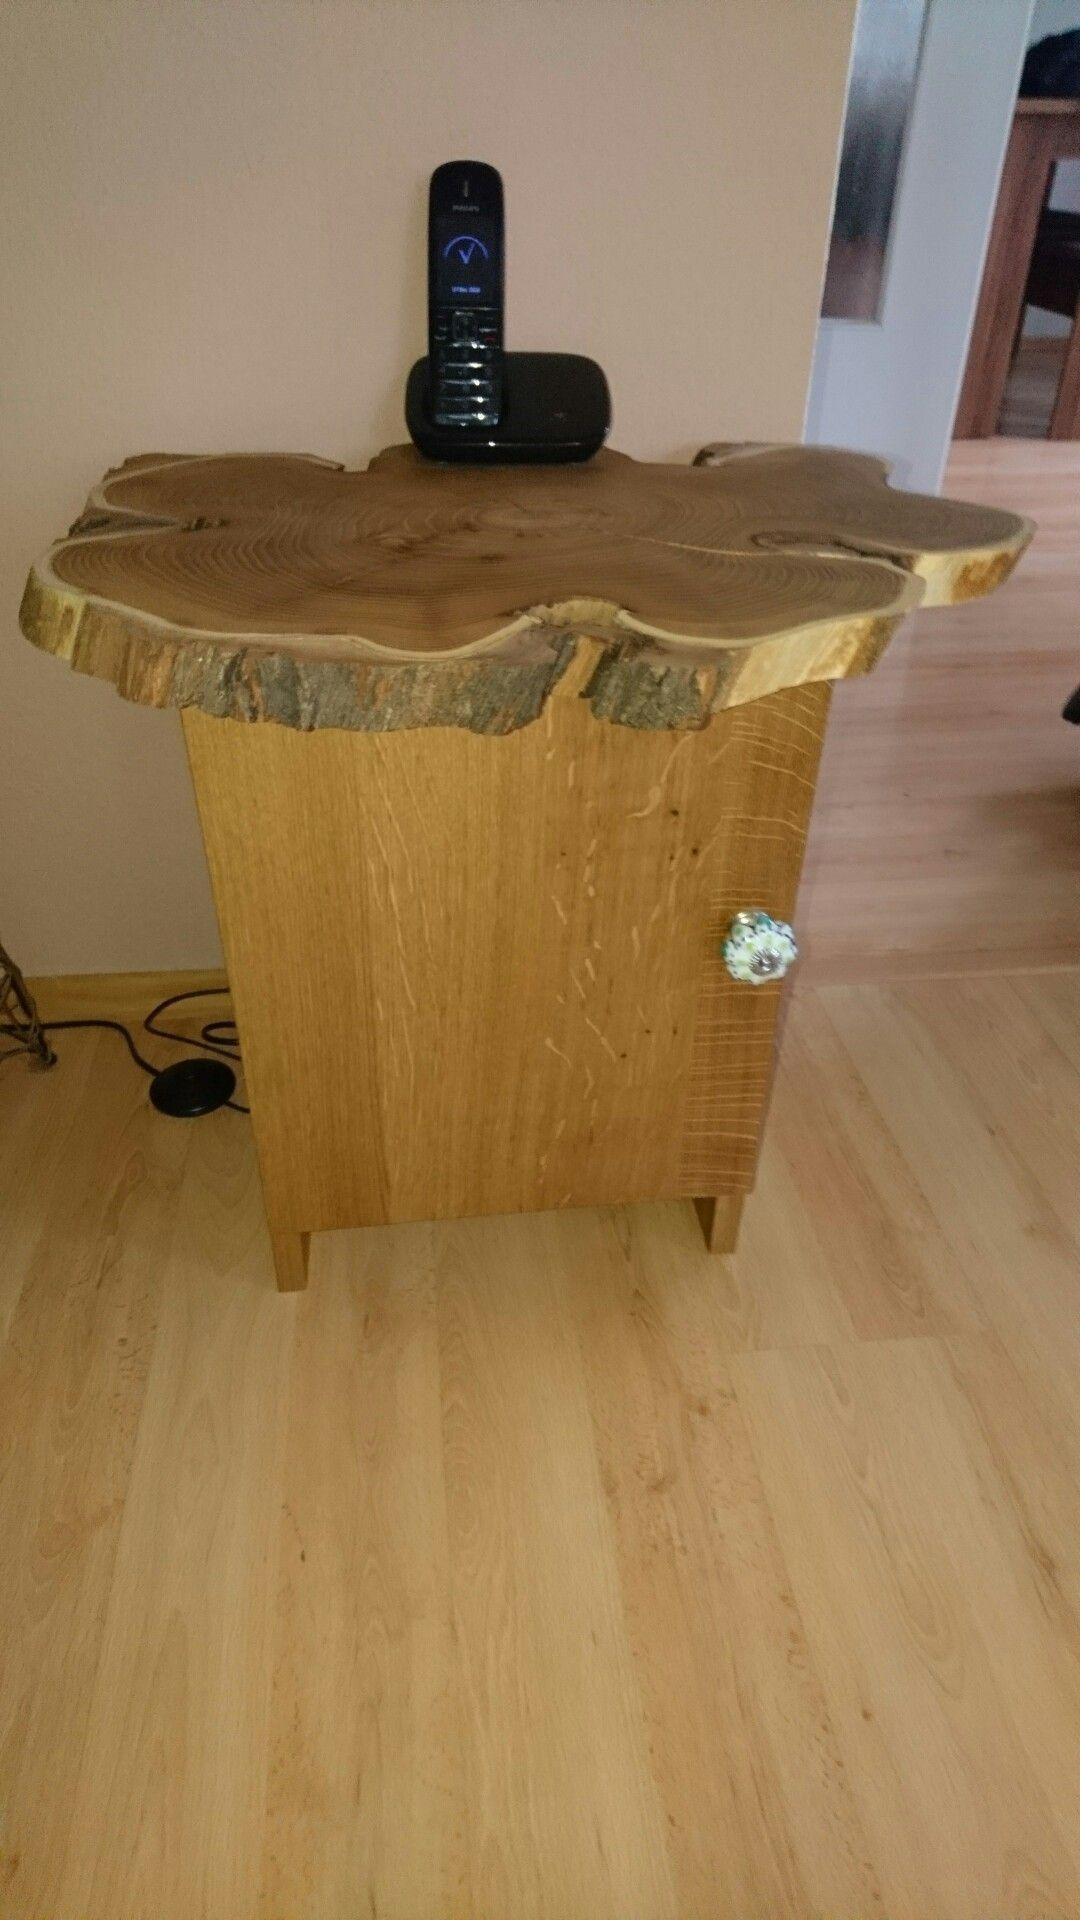 Épinglé par anthony till sur selfmade woodworks | pinterest